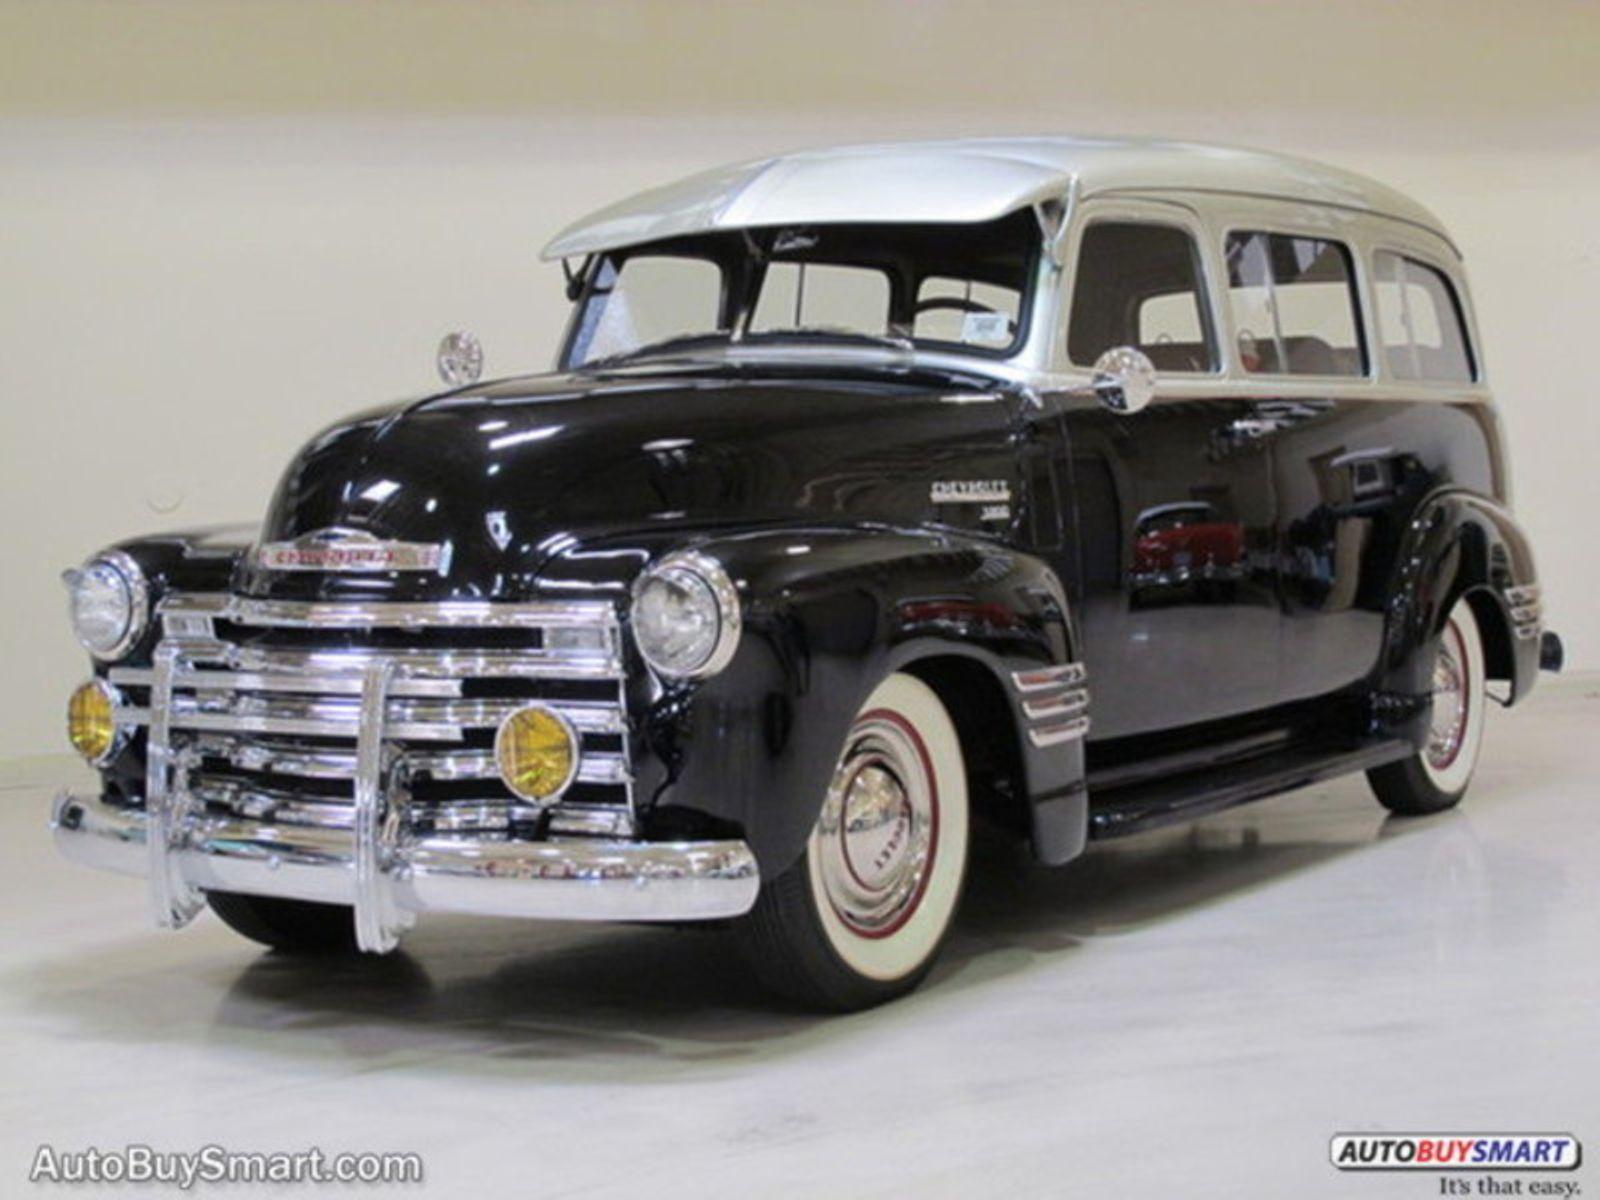 1950 chevrolet suburban 3100 in las vegas nv  [ 1600 x 1200 Pixel ]